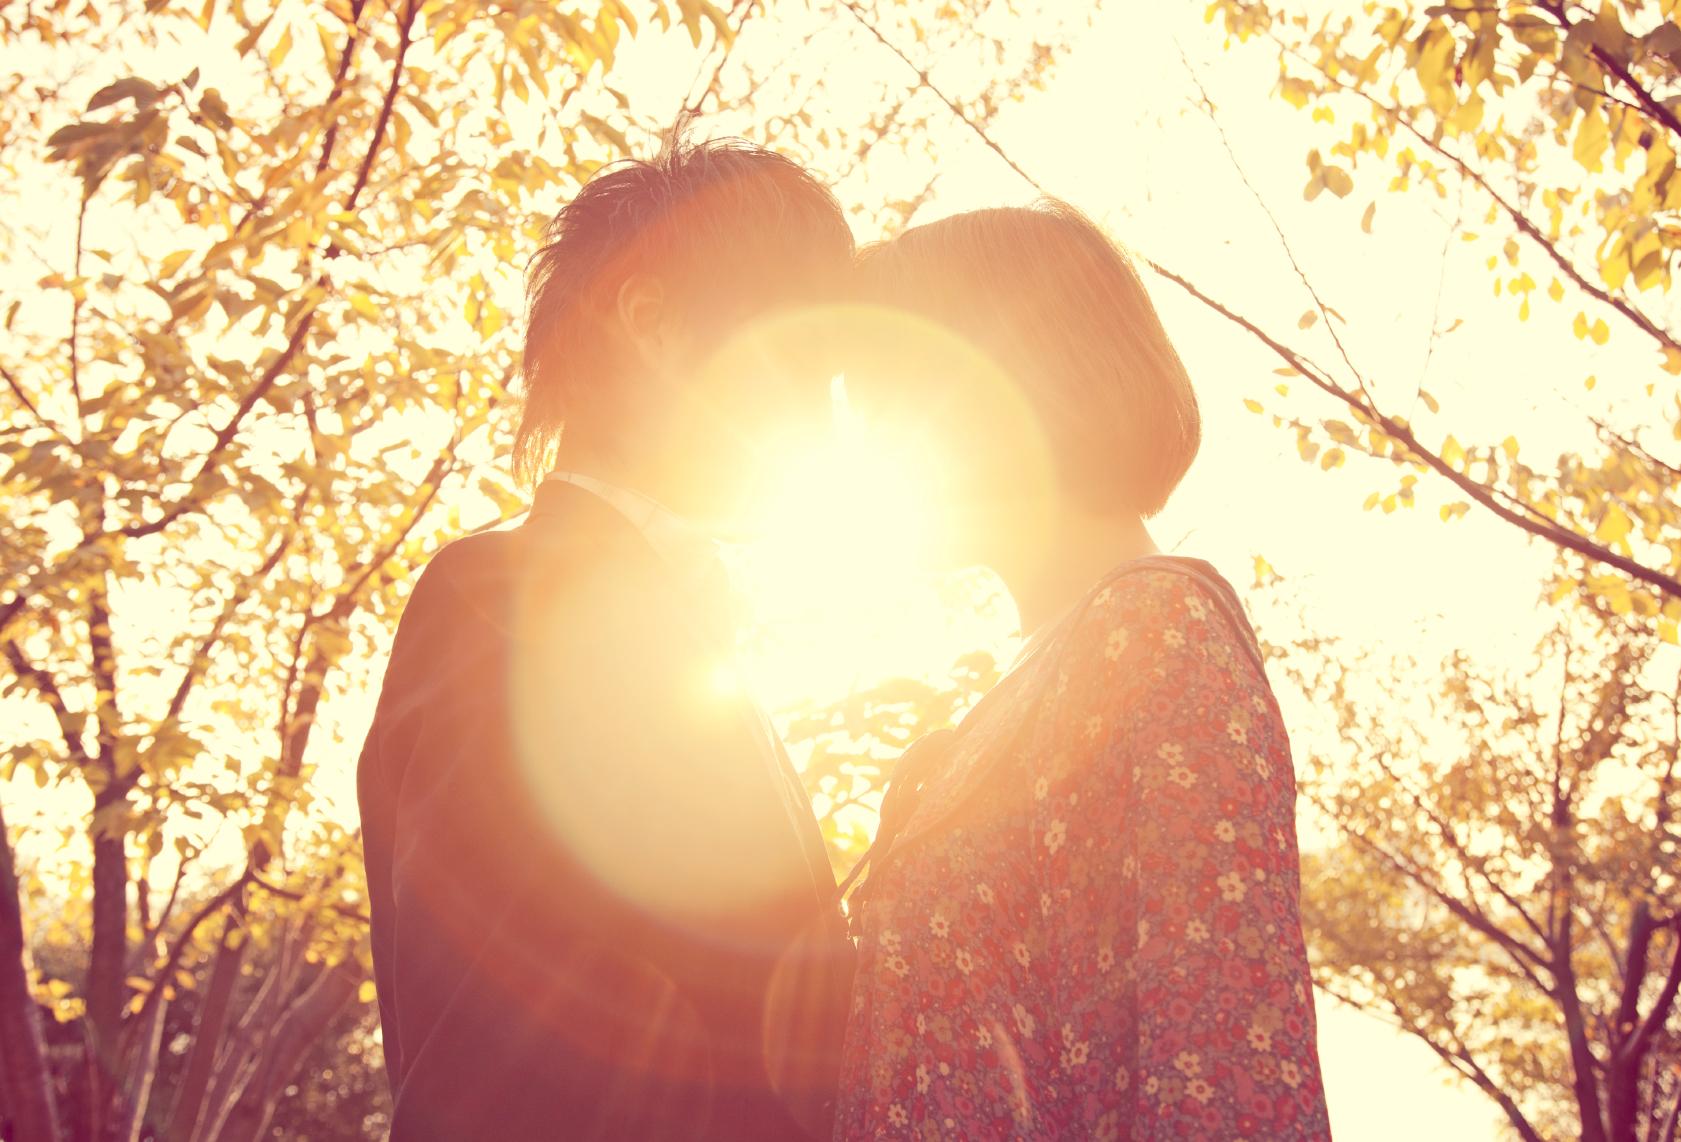 Couple in Sunlight